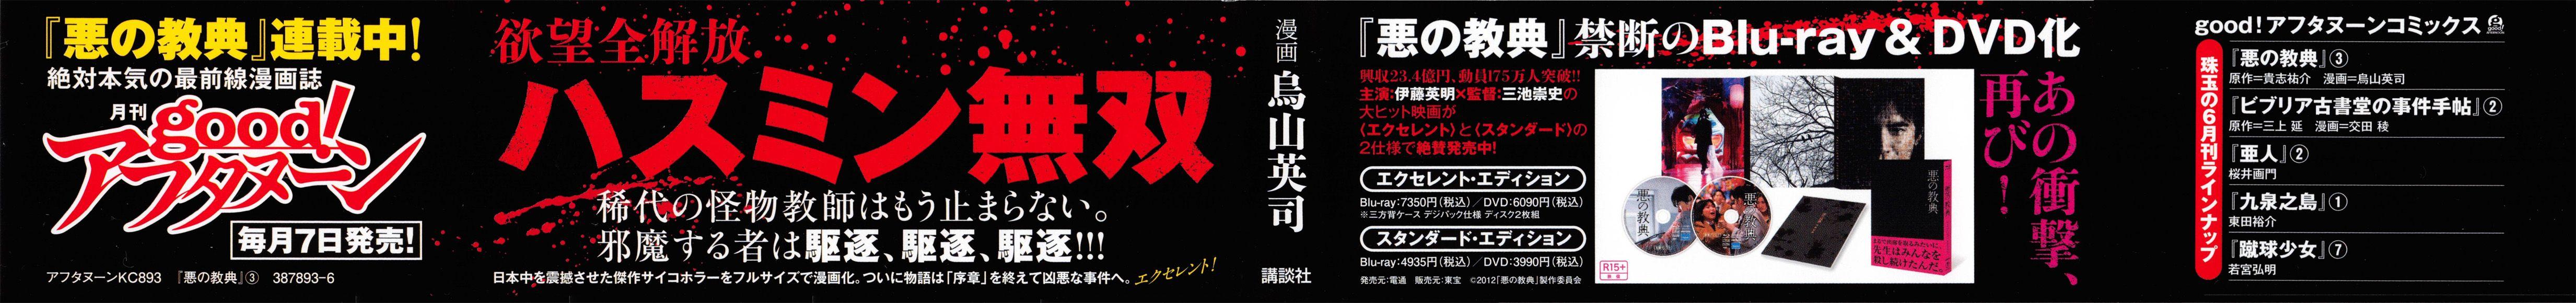 http://c5.ninemanga.com/es_manga/pic2/3/19523/524169/edc250903655029fe0bef183aa4de288.jpg Page 2